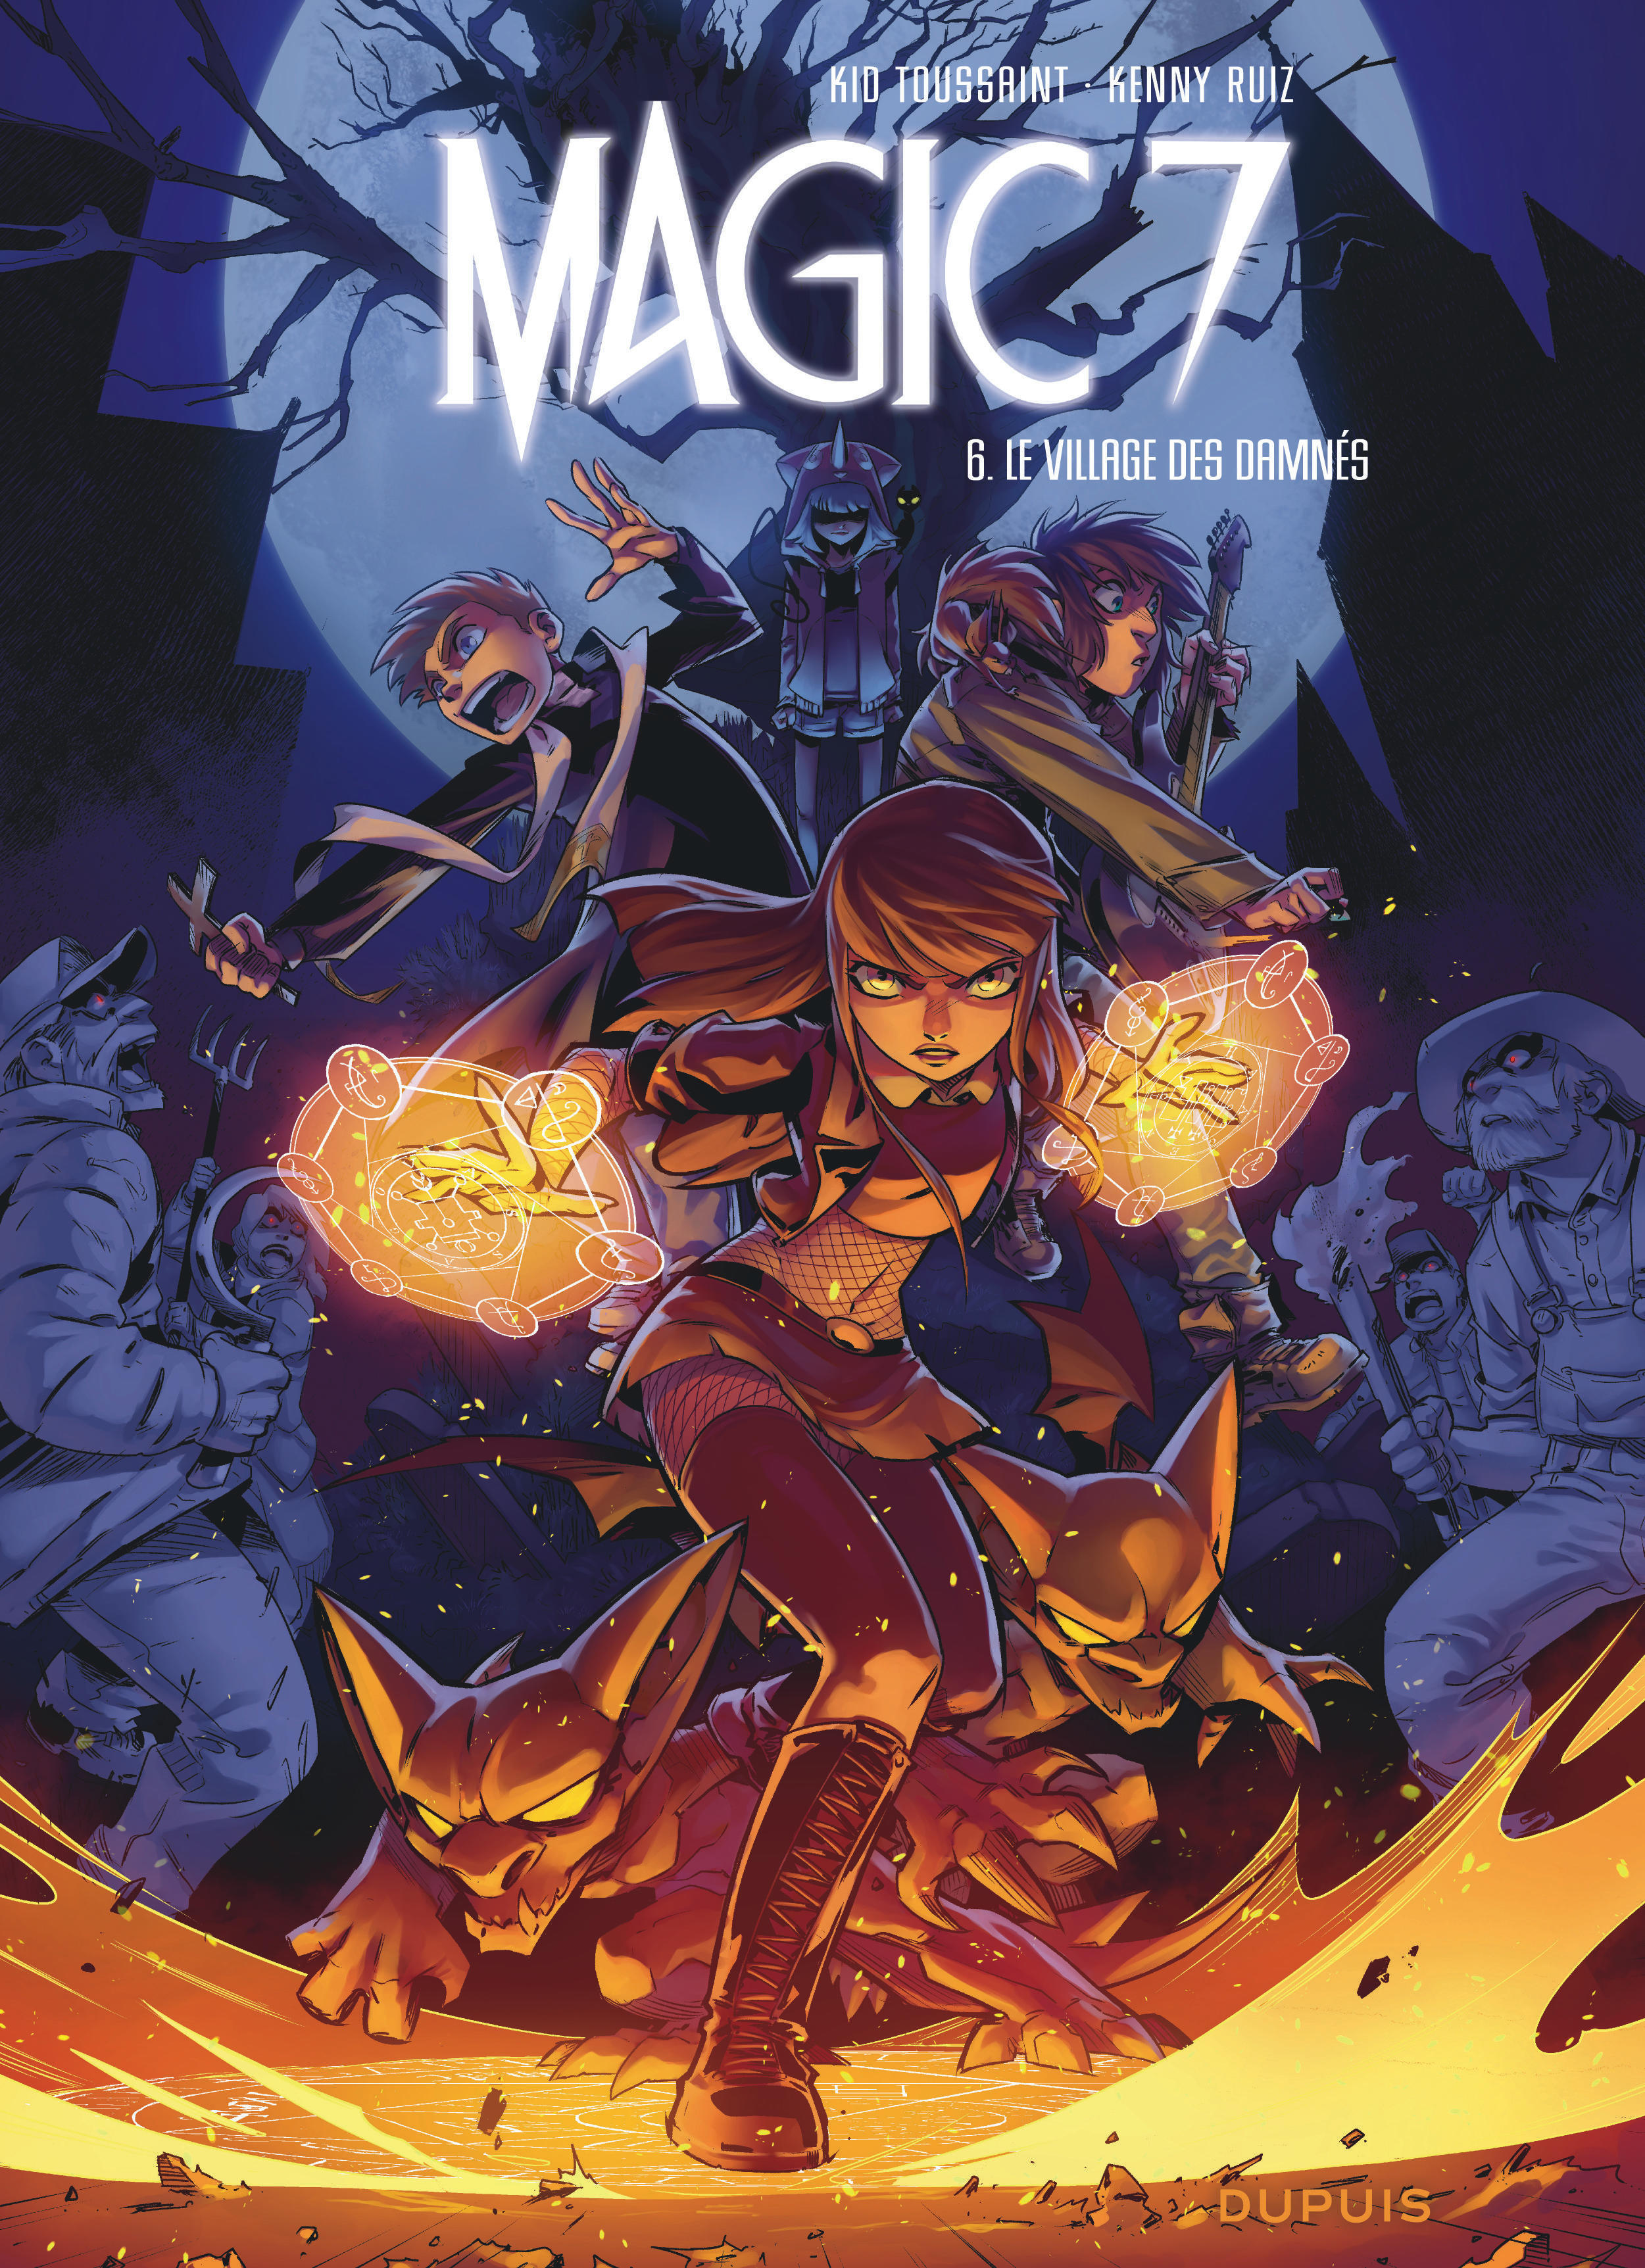 MAGIC 7 T6 MAGIC 7 - TOME 6 - LE VILLAGE DES DAMNES